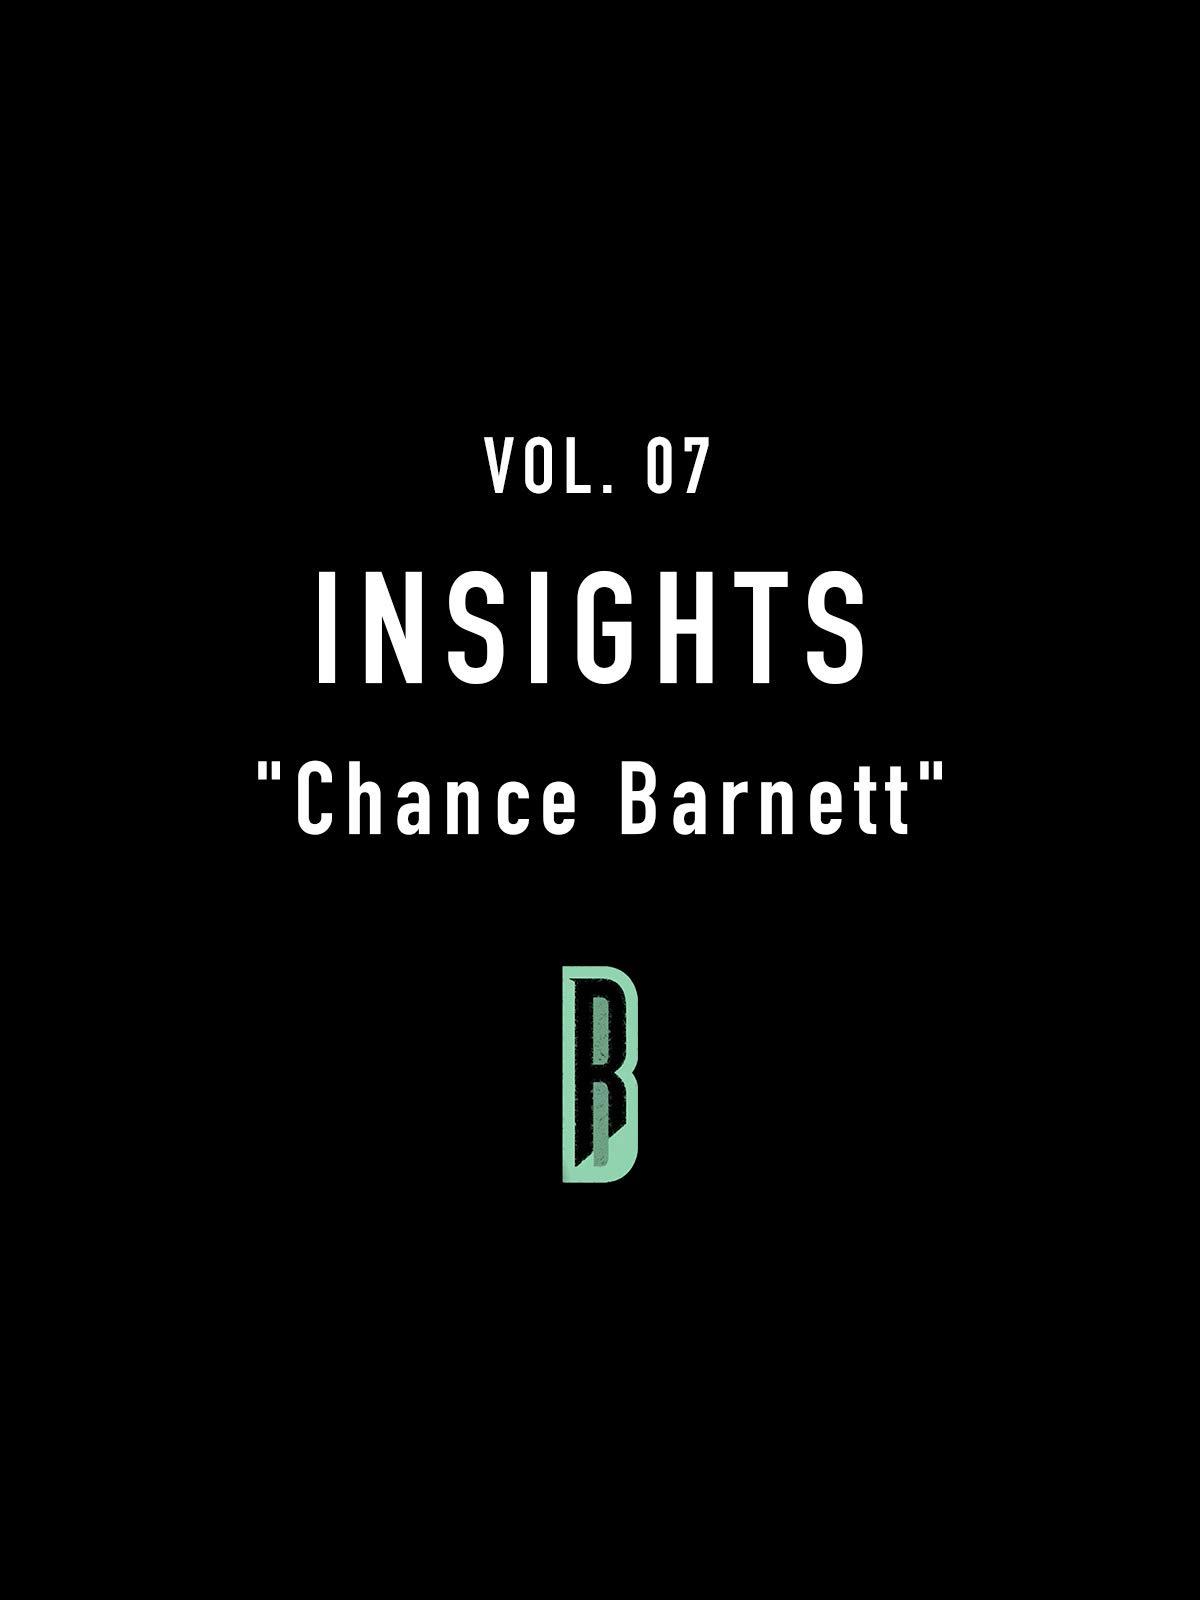 Insights Vol. 07